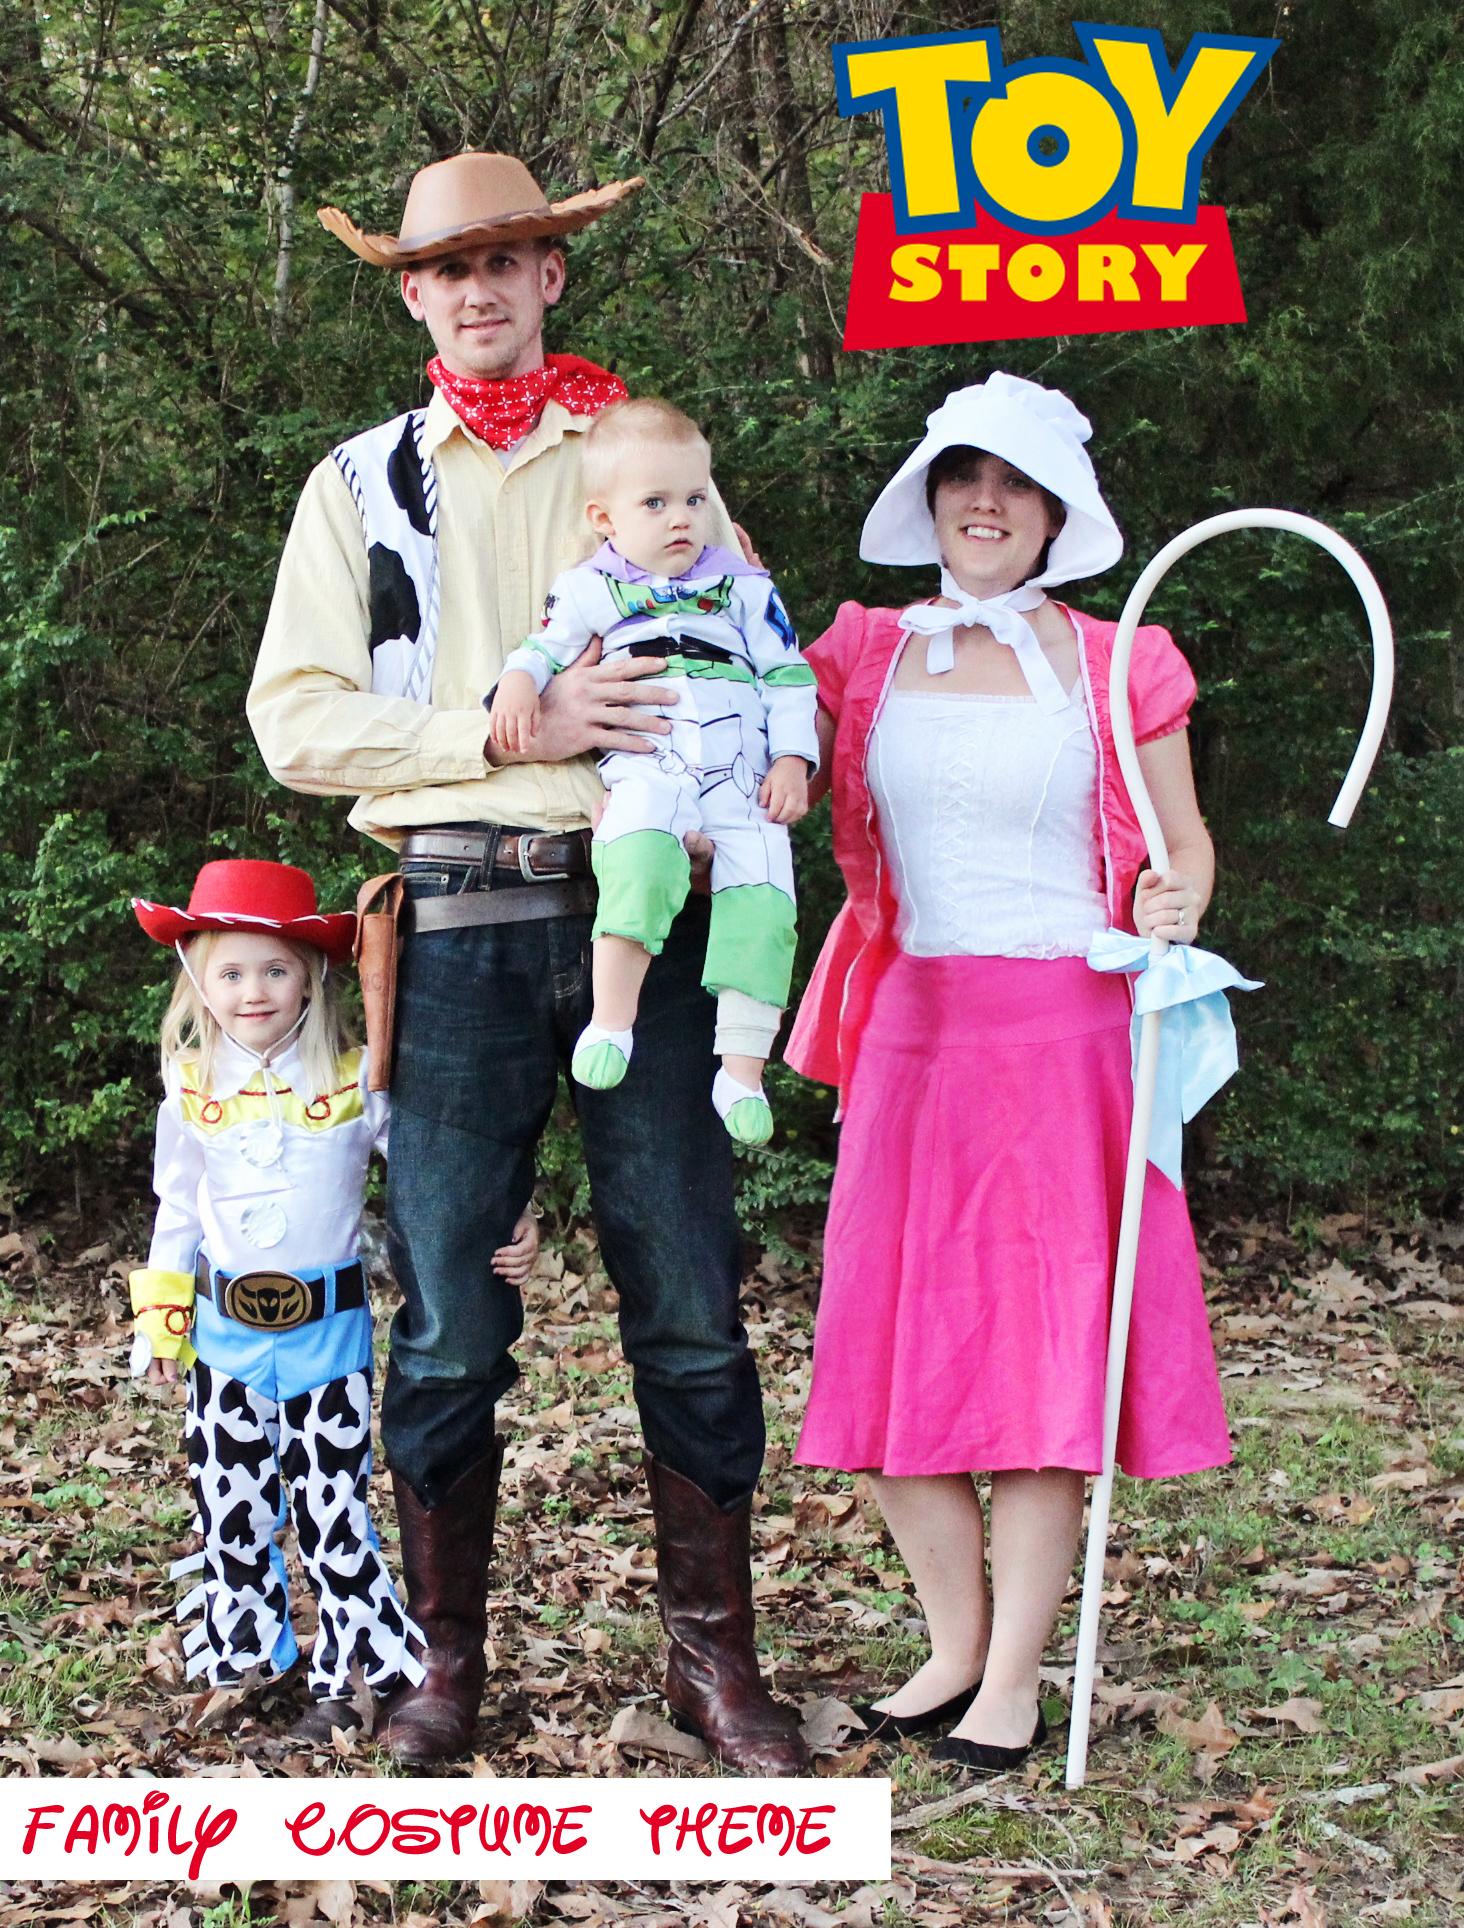 Family Halloween Costume Idea: Toy Story Theme - Sweet T Makes Three